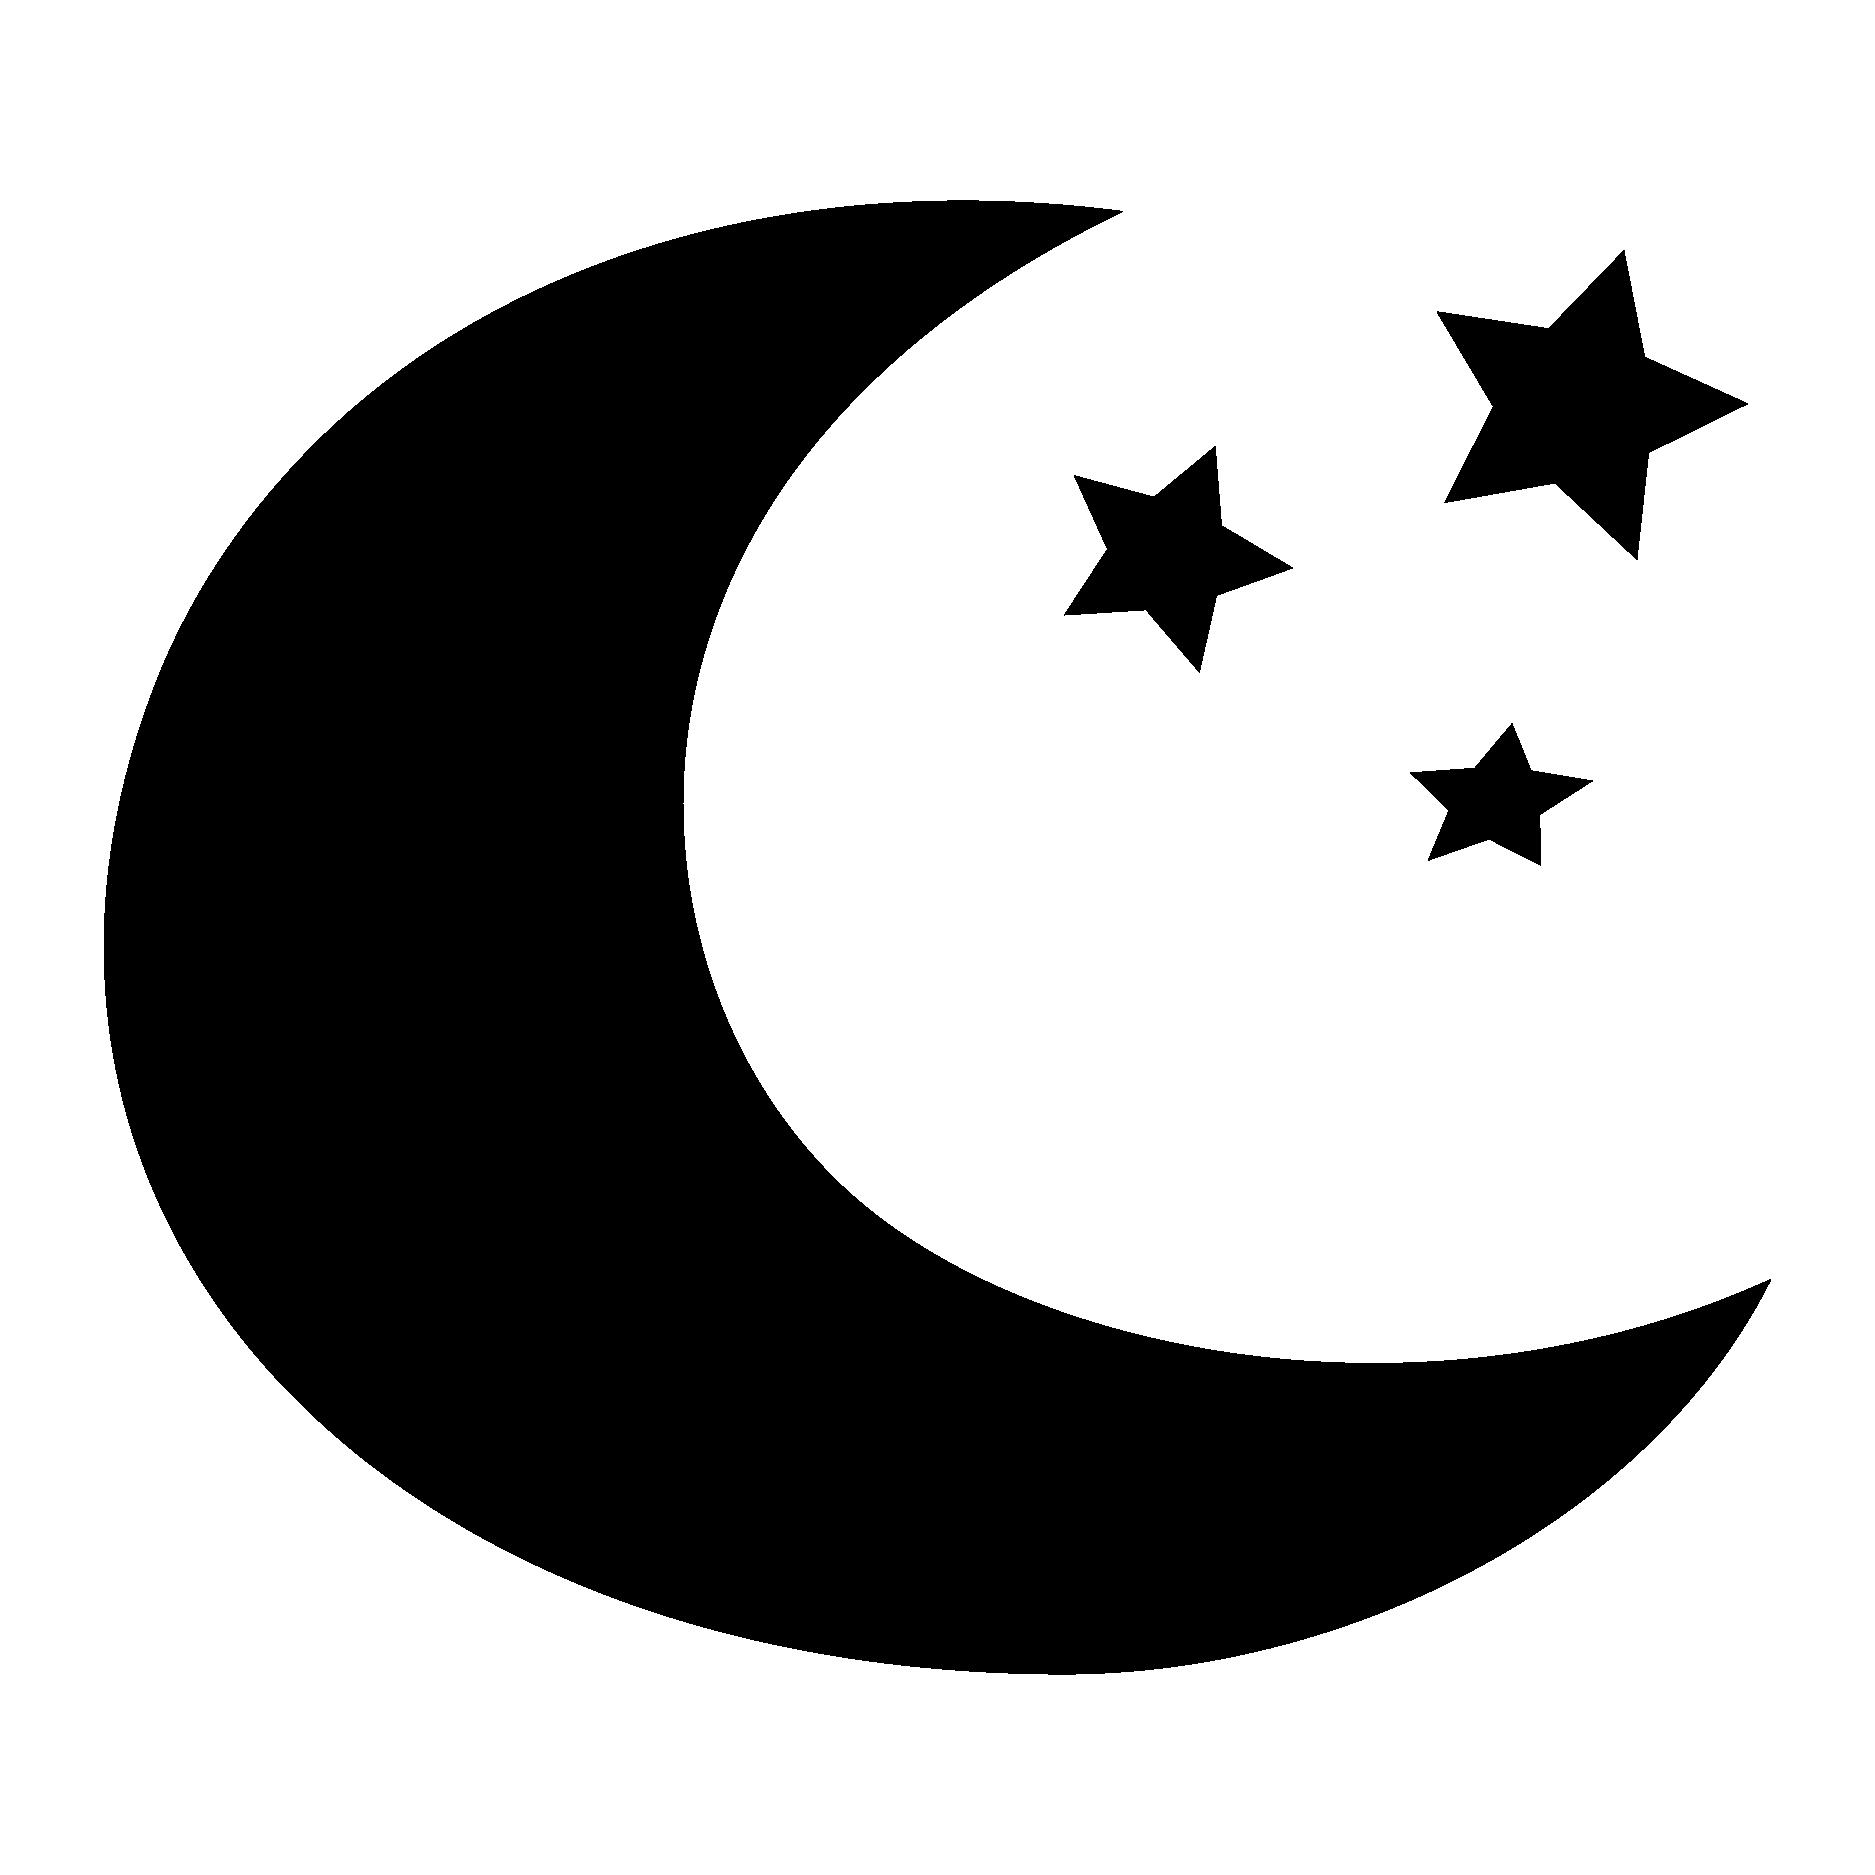 1875x1875 Moon Silhouette Clipart